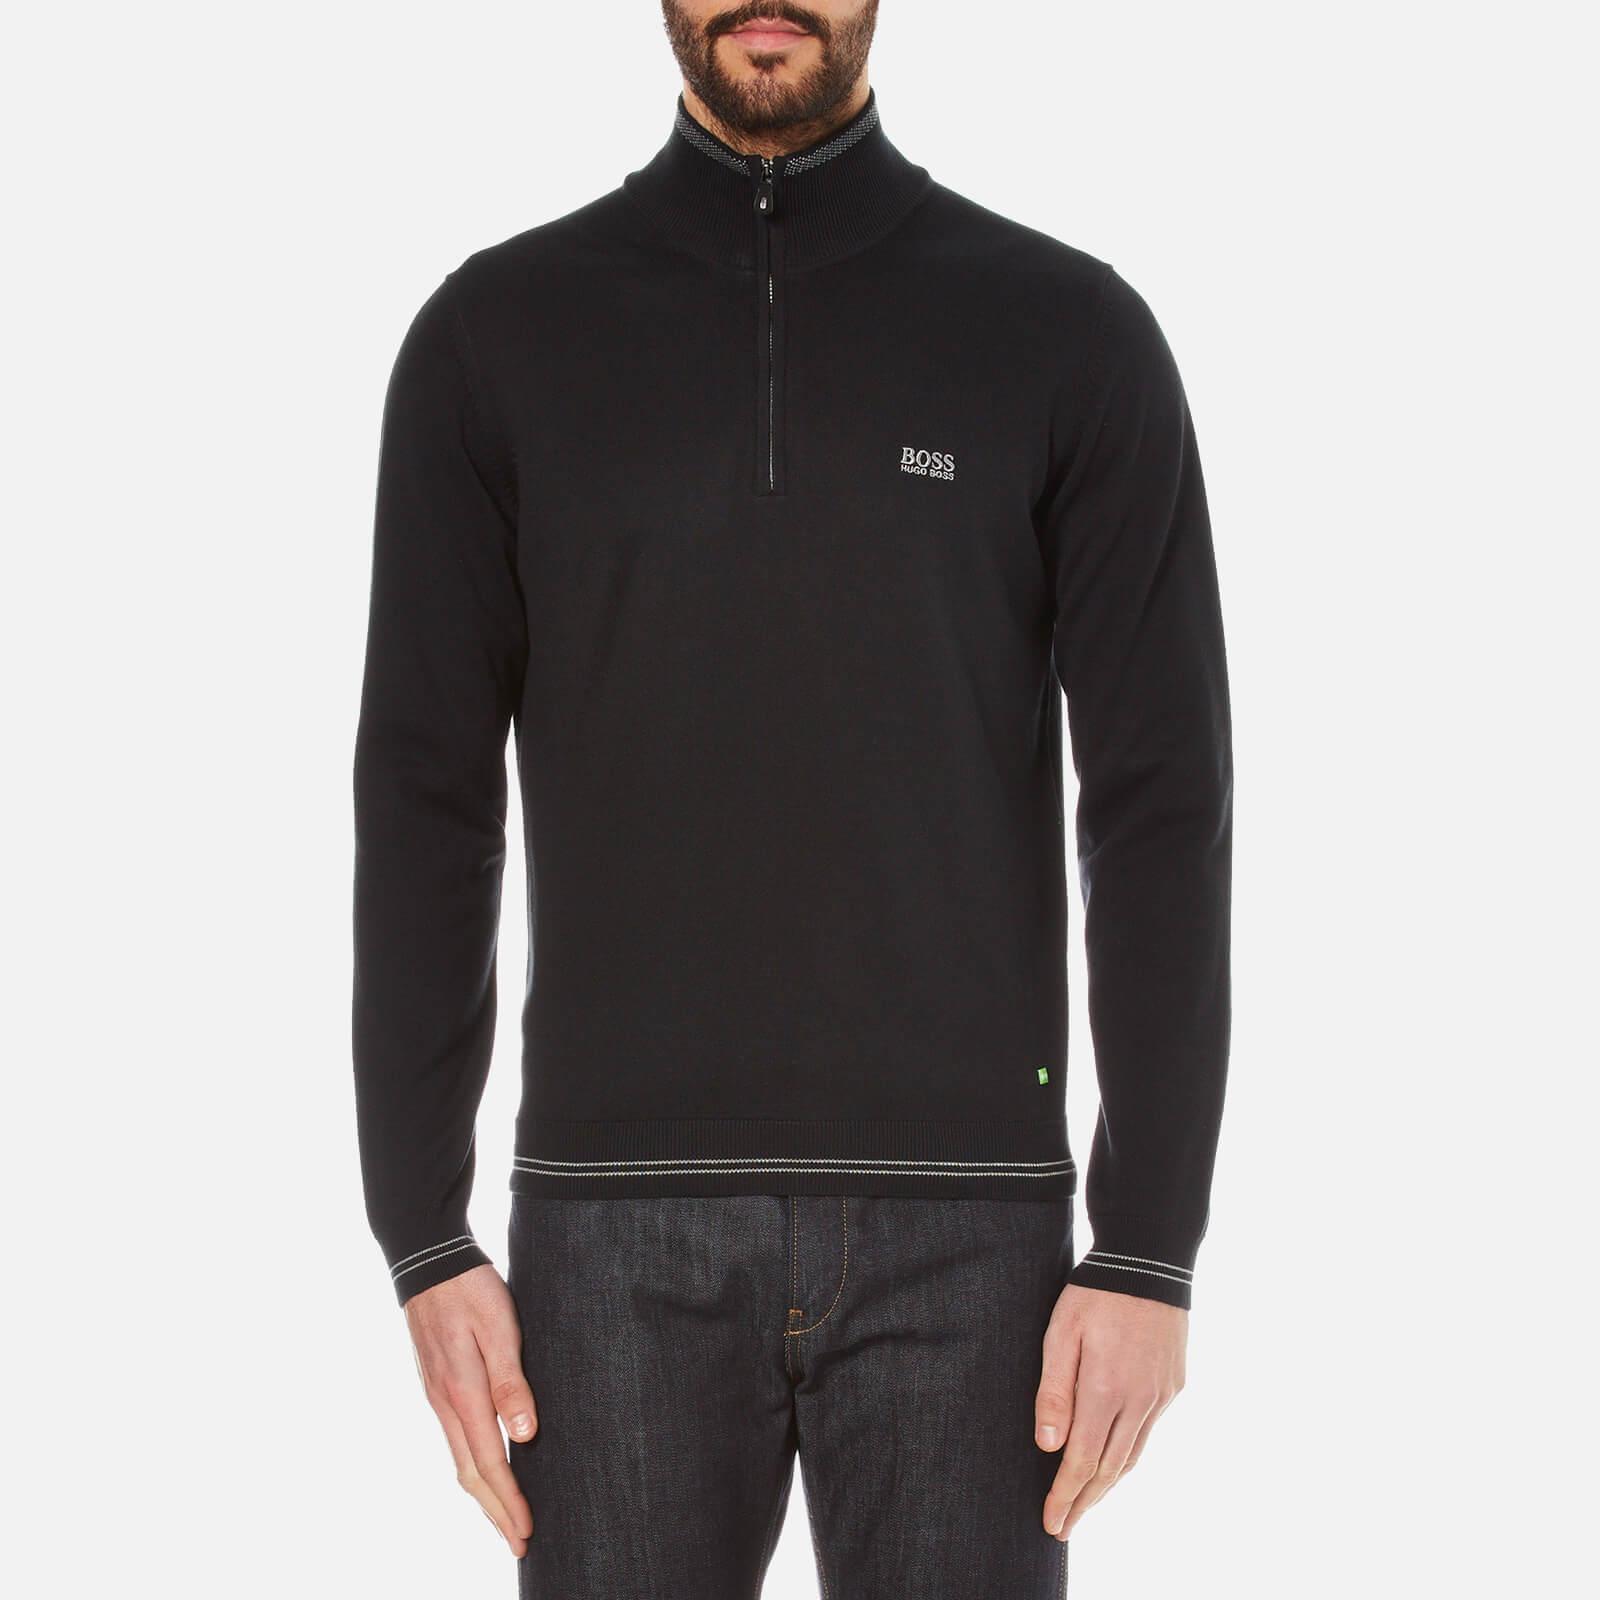 c52231bff59 BOSS Green Men's Zime Zip Neck Knitted Jumper - Black